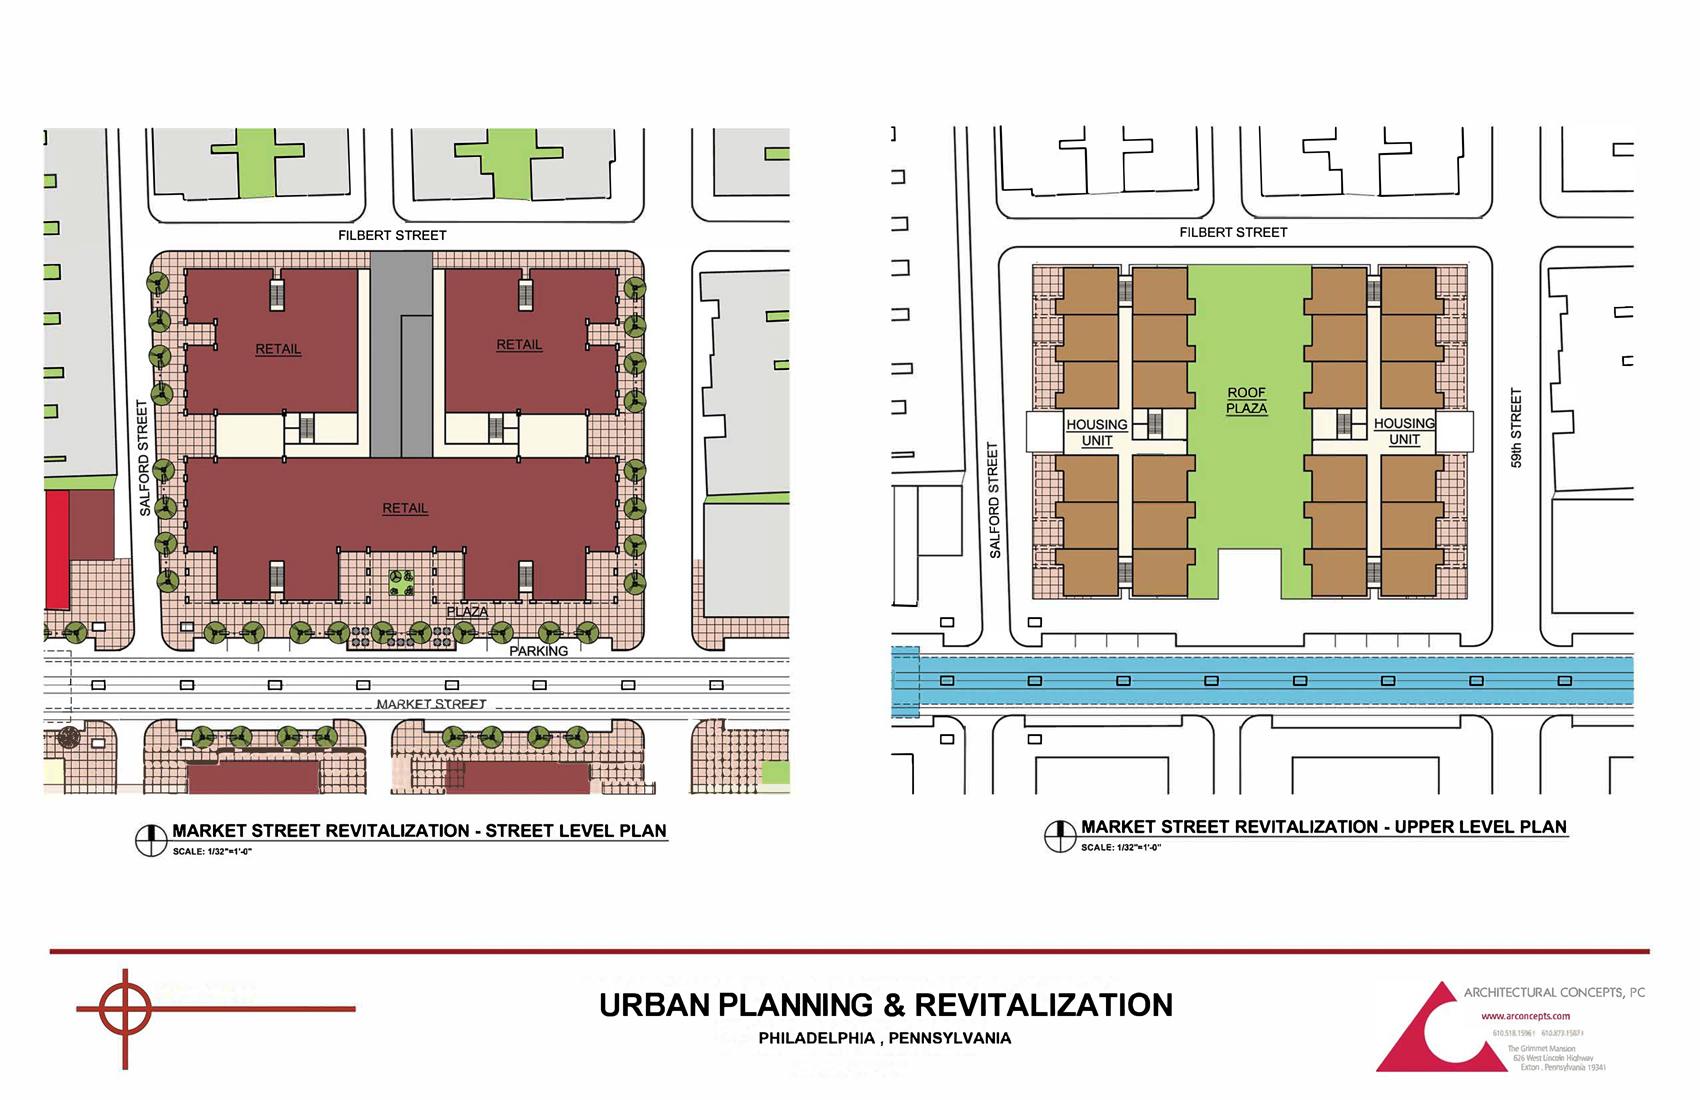 Urban Planning & Revitalization - Master Planning